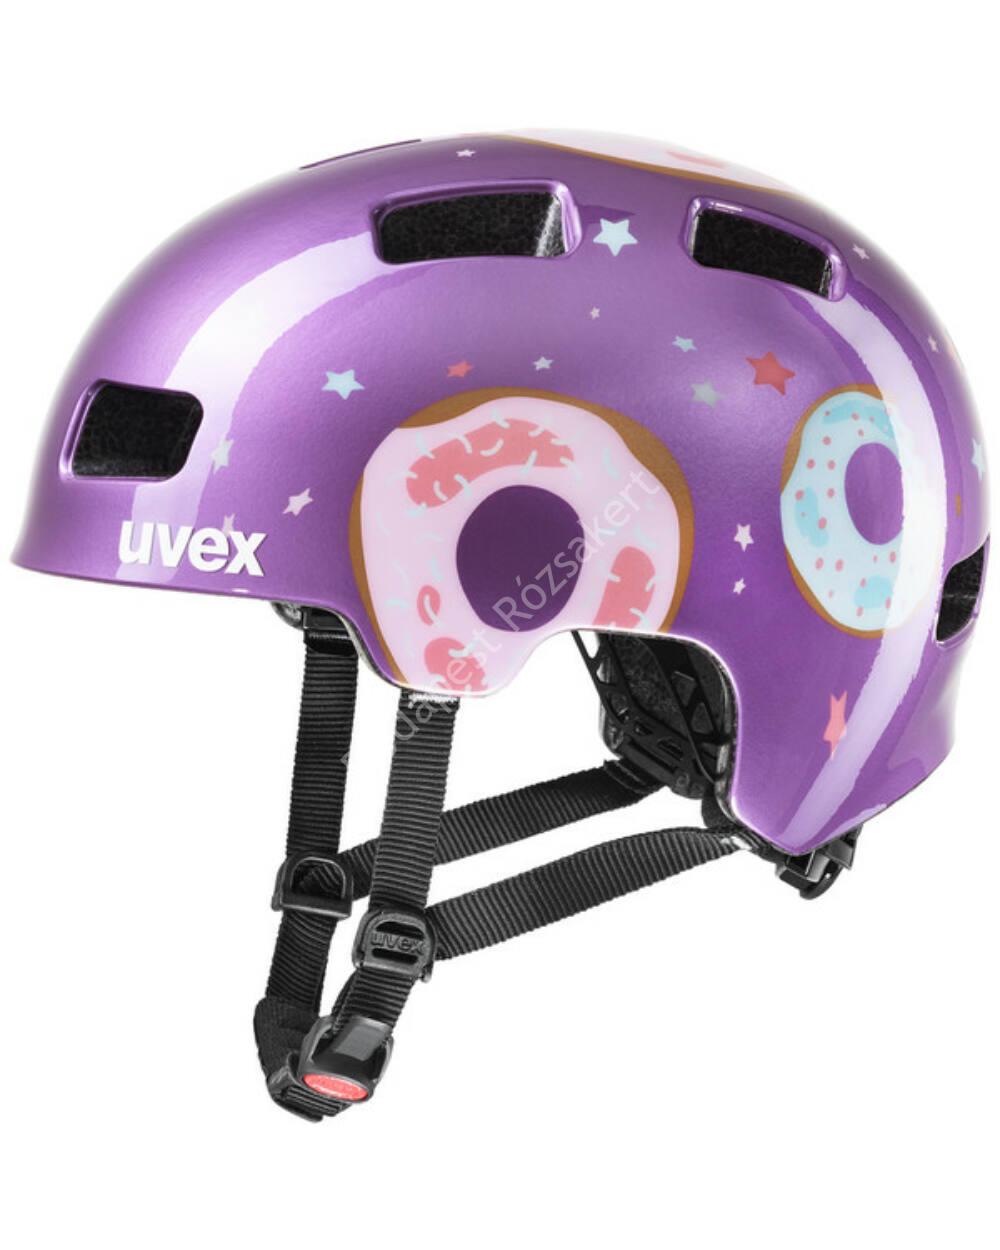 Uvex Hlmt 4 purple donut bukósisak, 55-58 cm